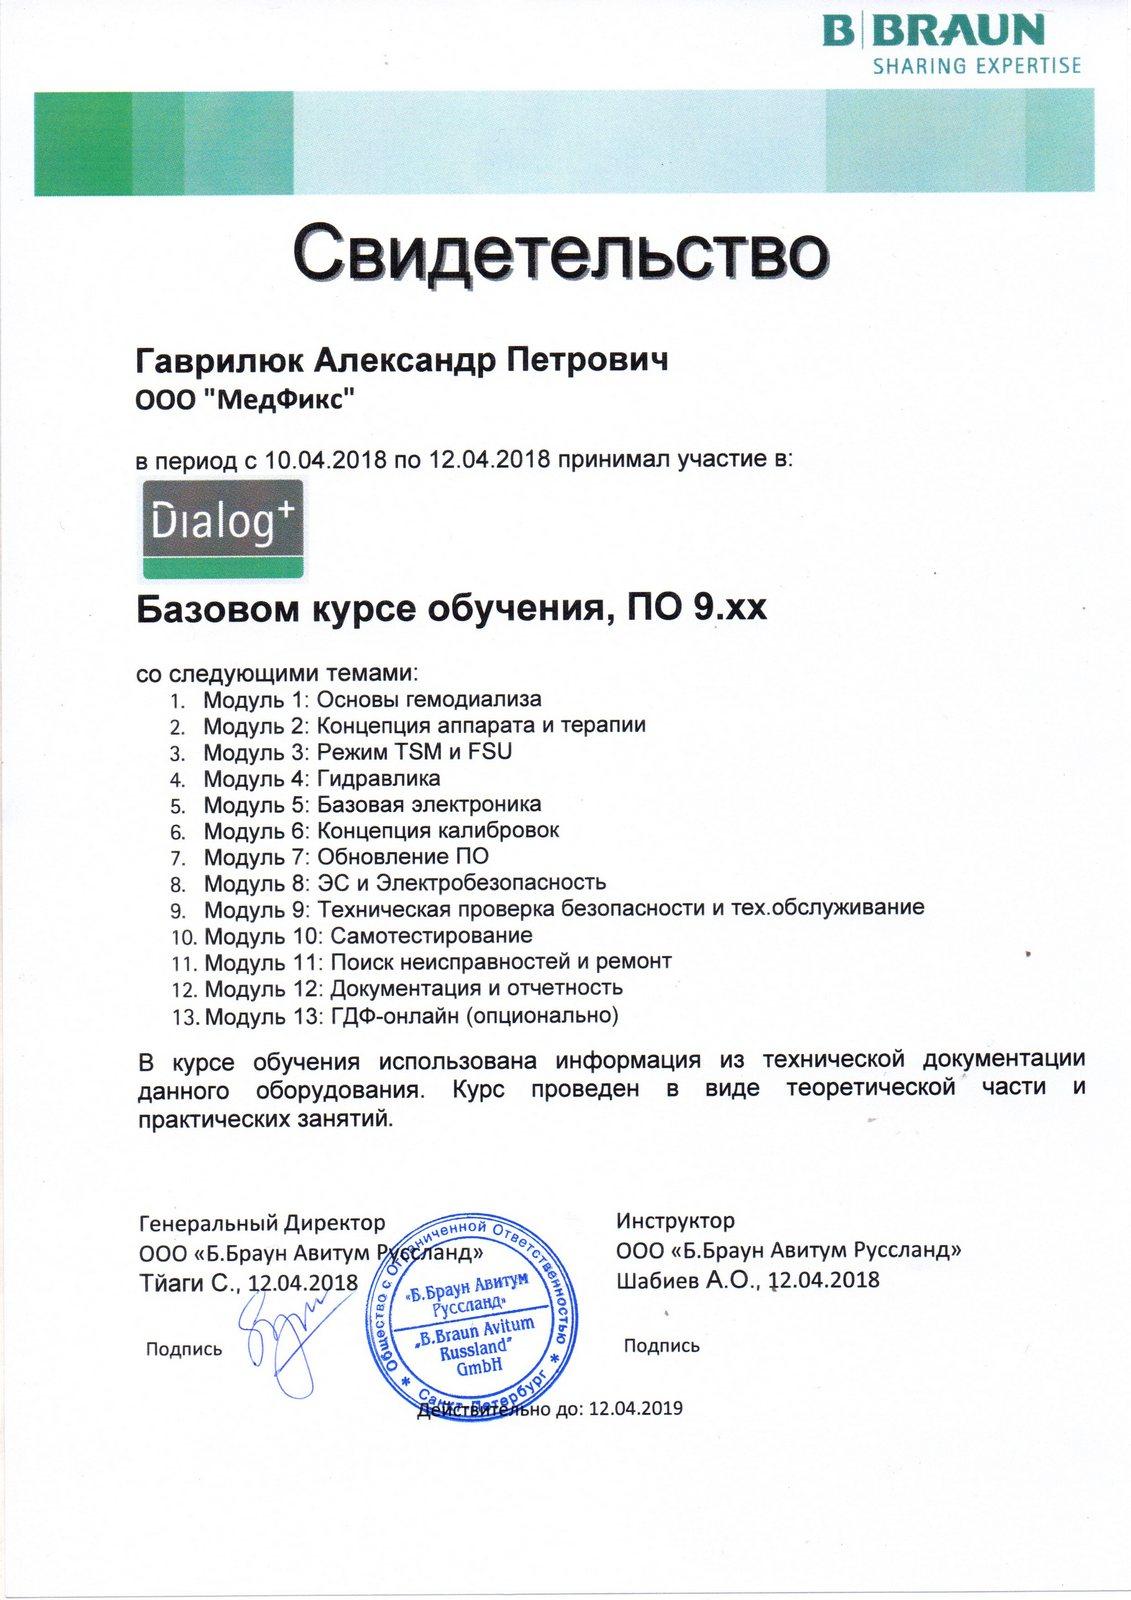 gemodializ - BBraun-Gavrilyuk-12.04.2019